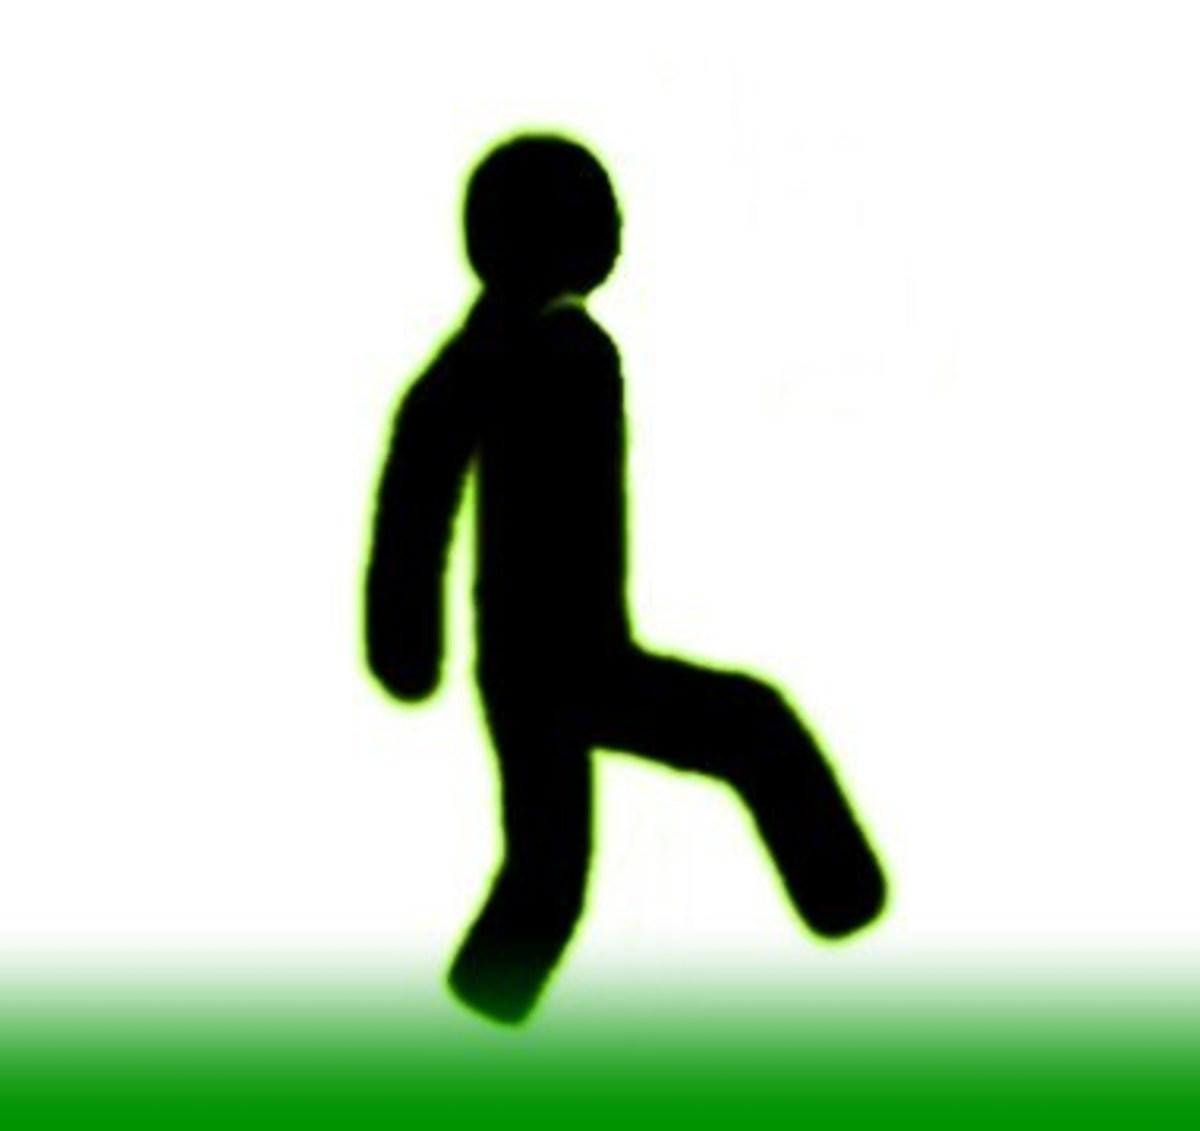 Raising One Leg–Kicking/Tripping/Clipping